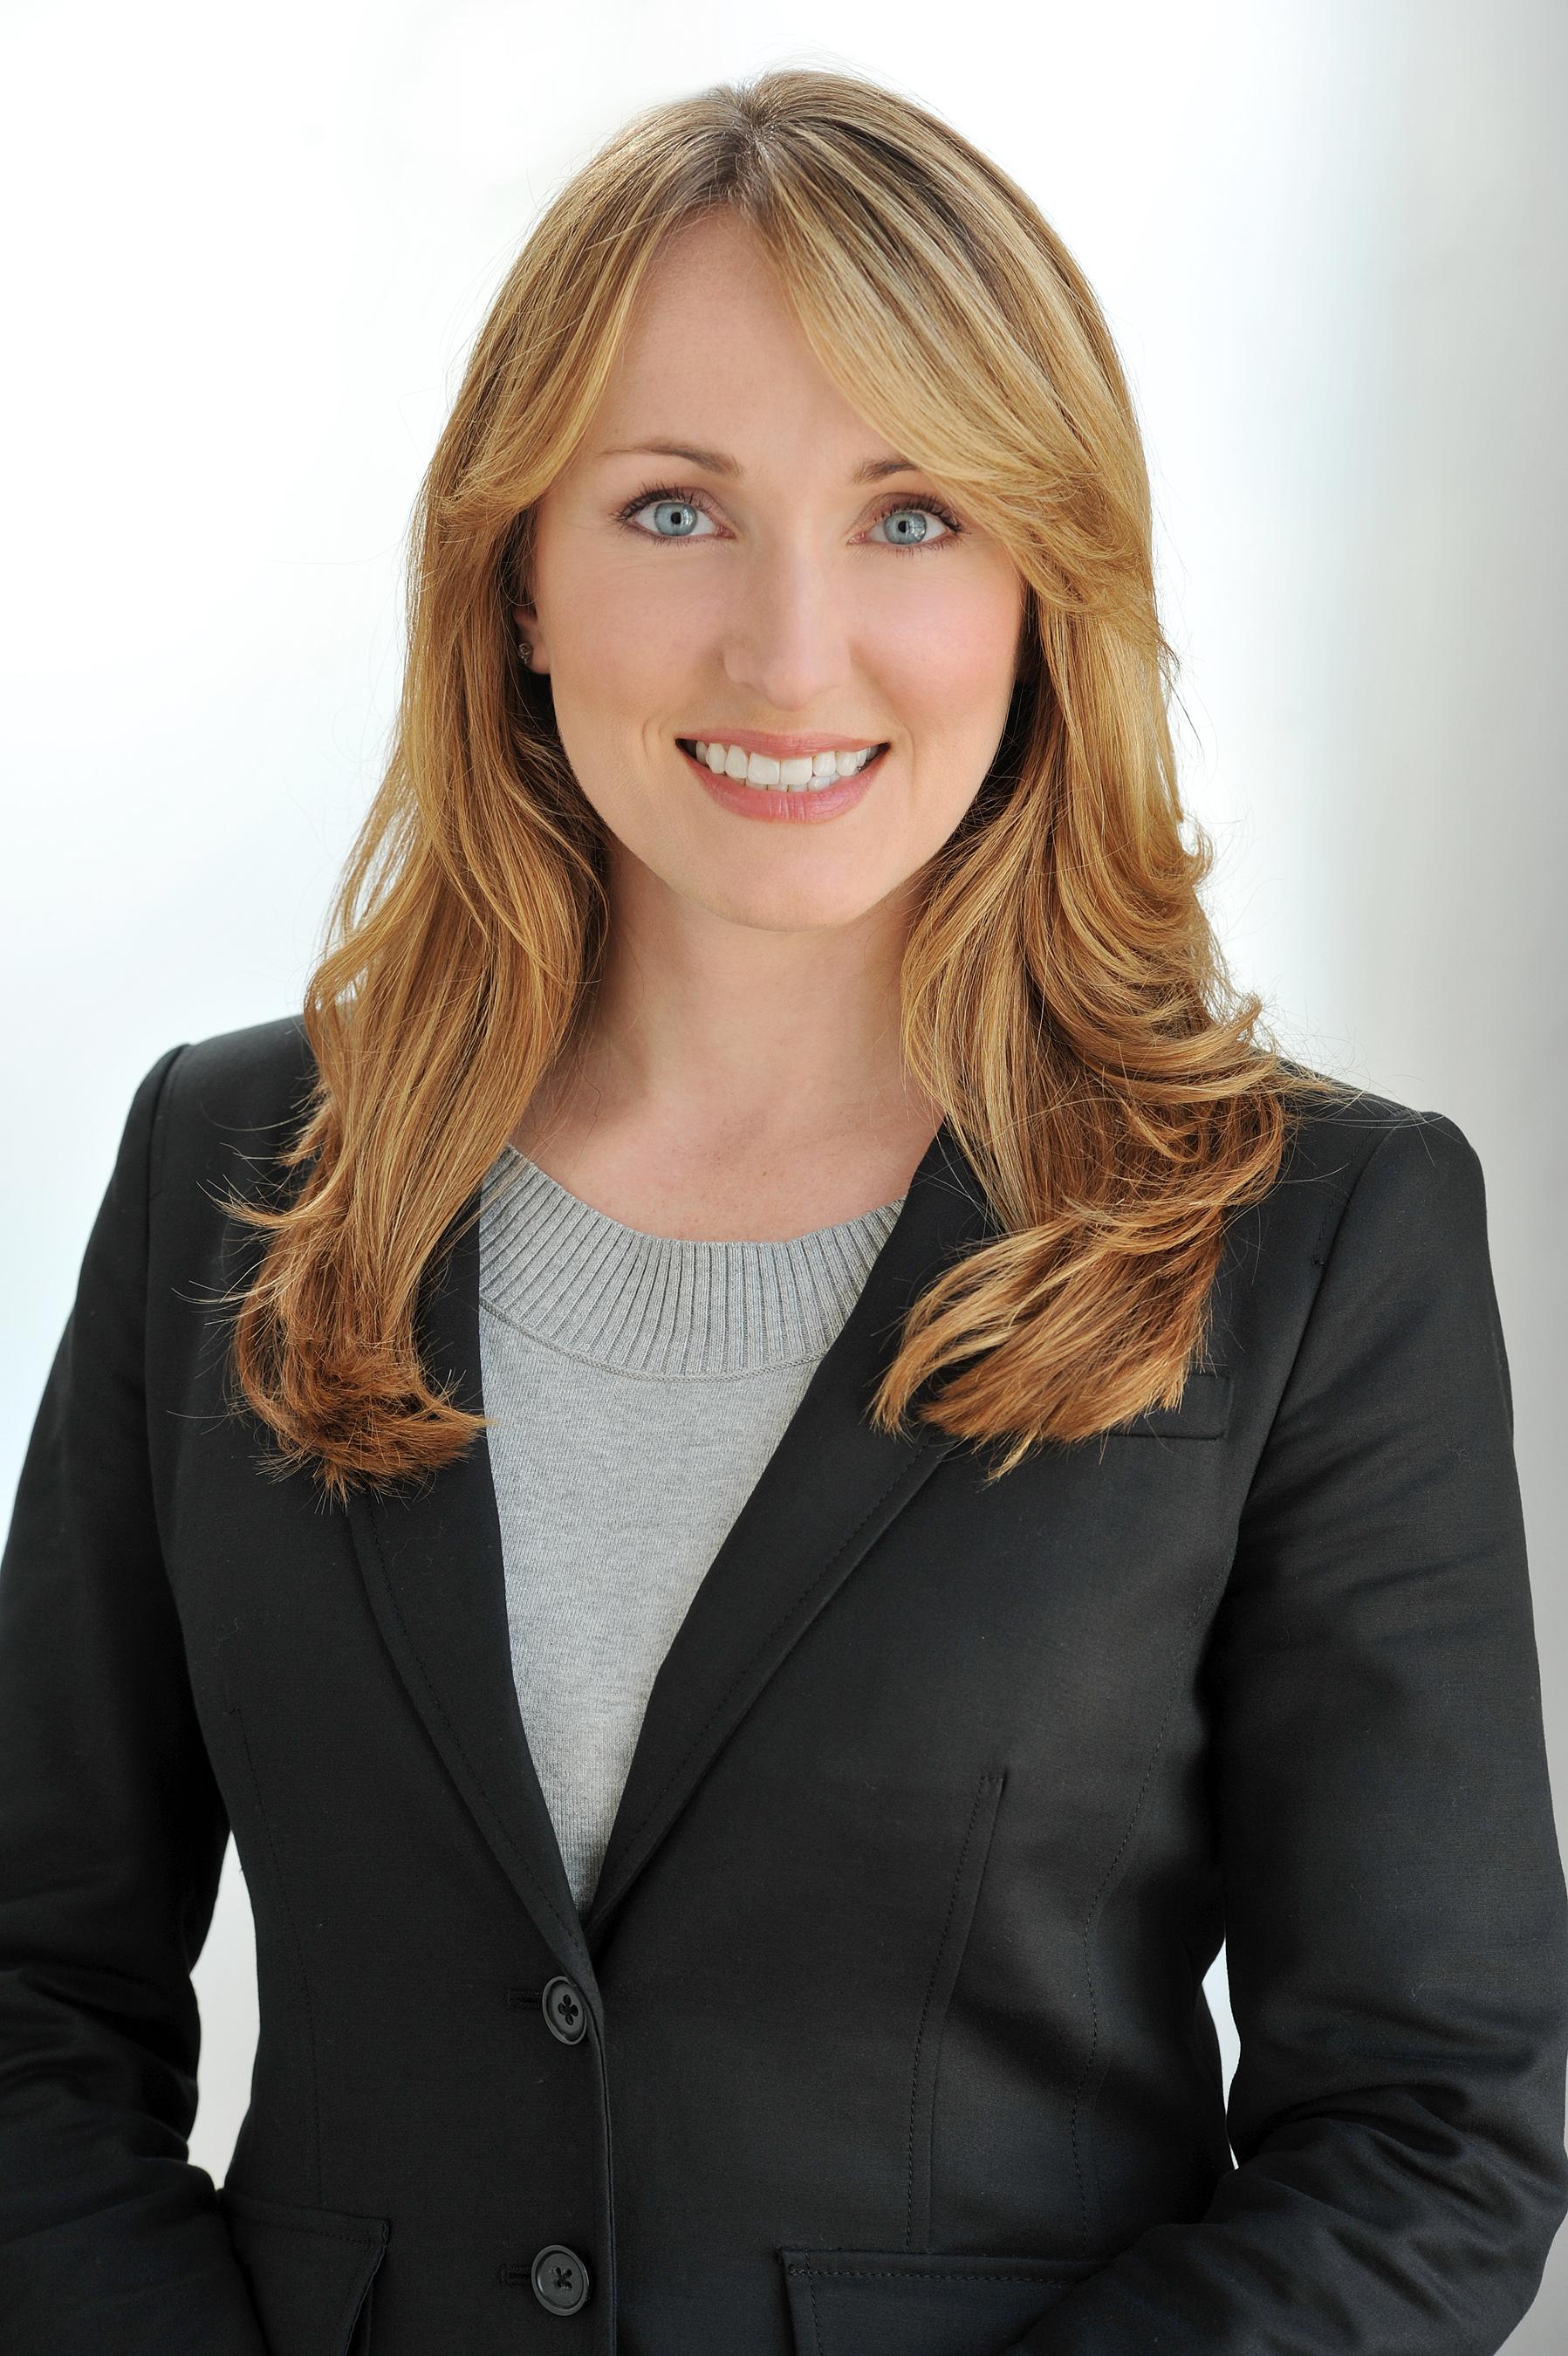 Christine Toes Muldoon